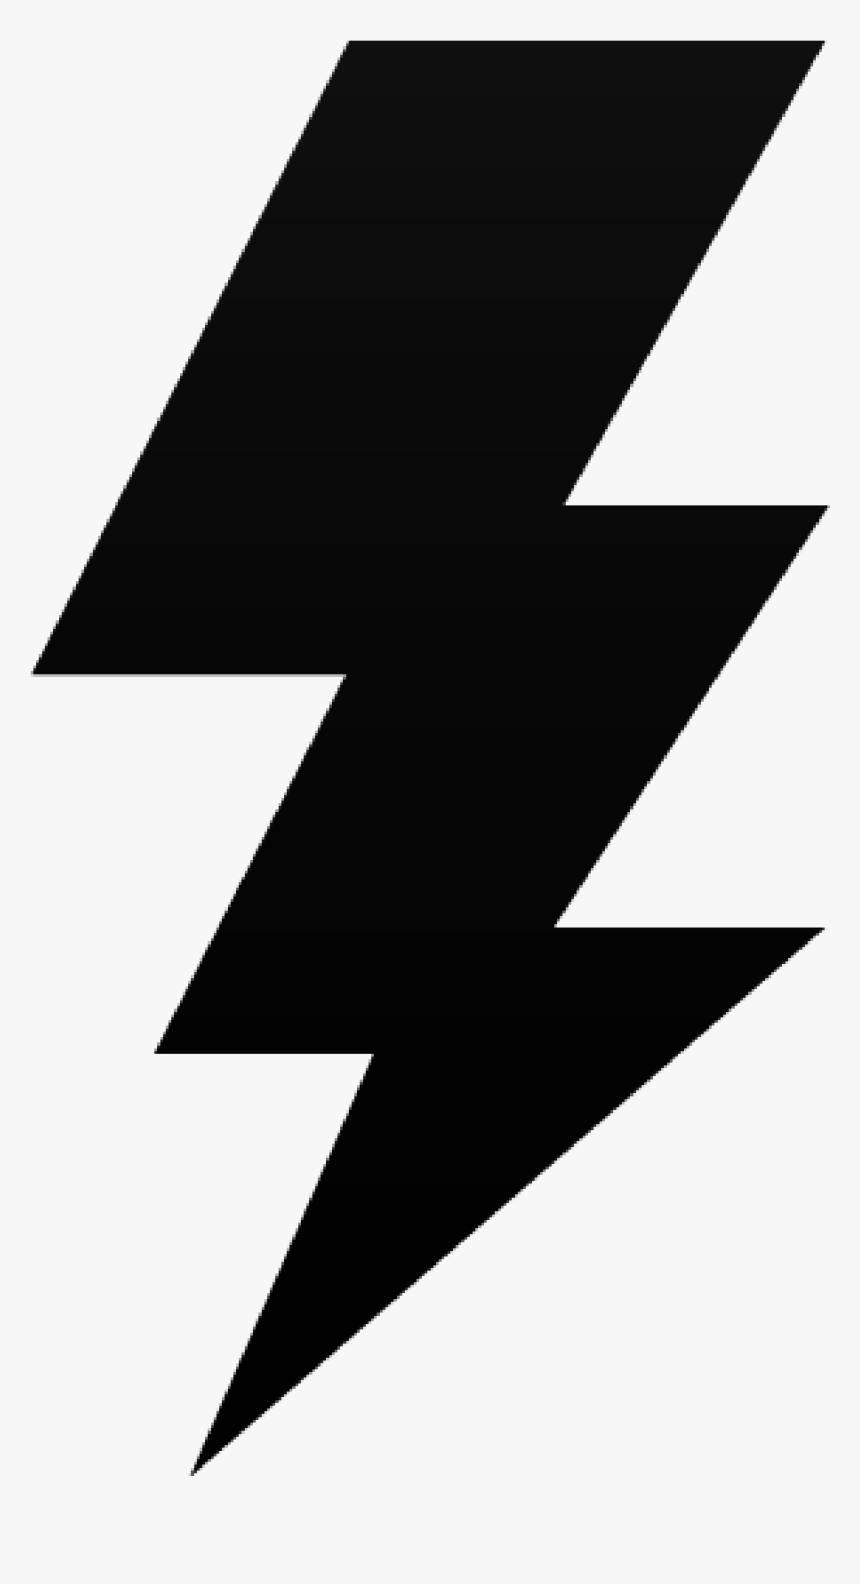 Transparent Groundbreaking Clipart - Lightning Bolt .ico Gnu, HD Png Download, Free Download